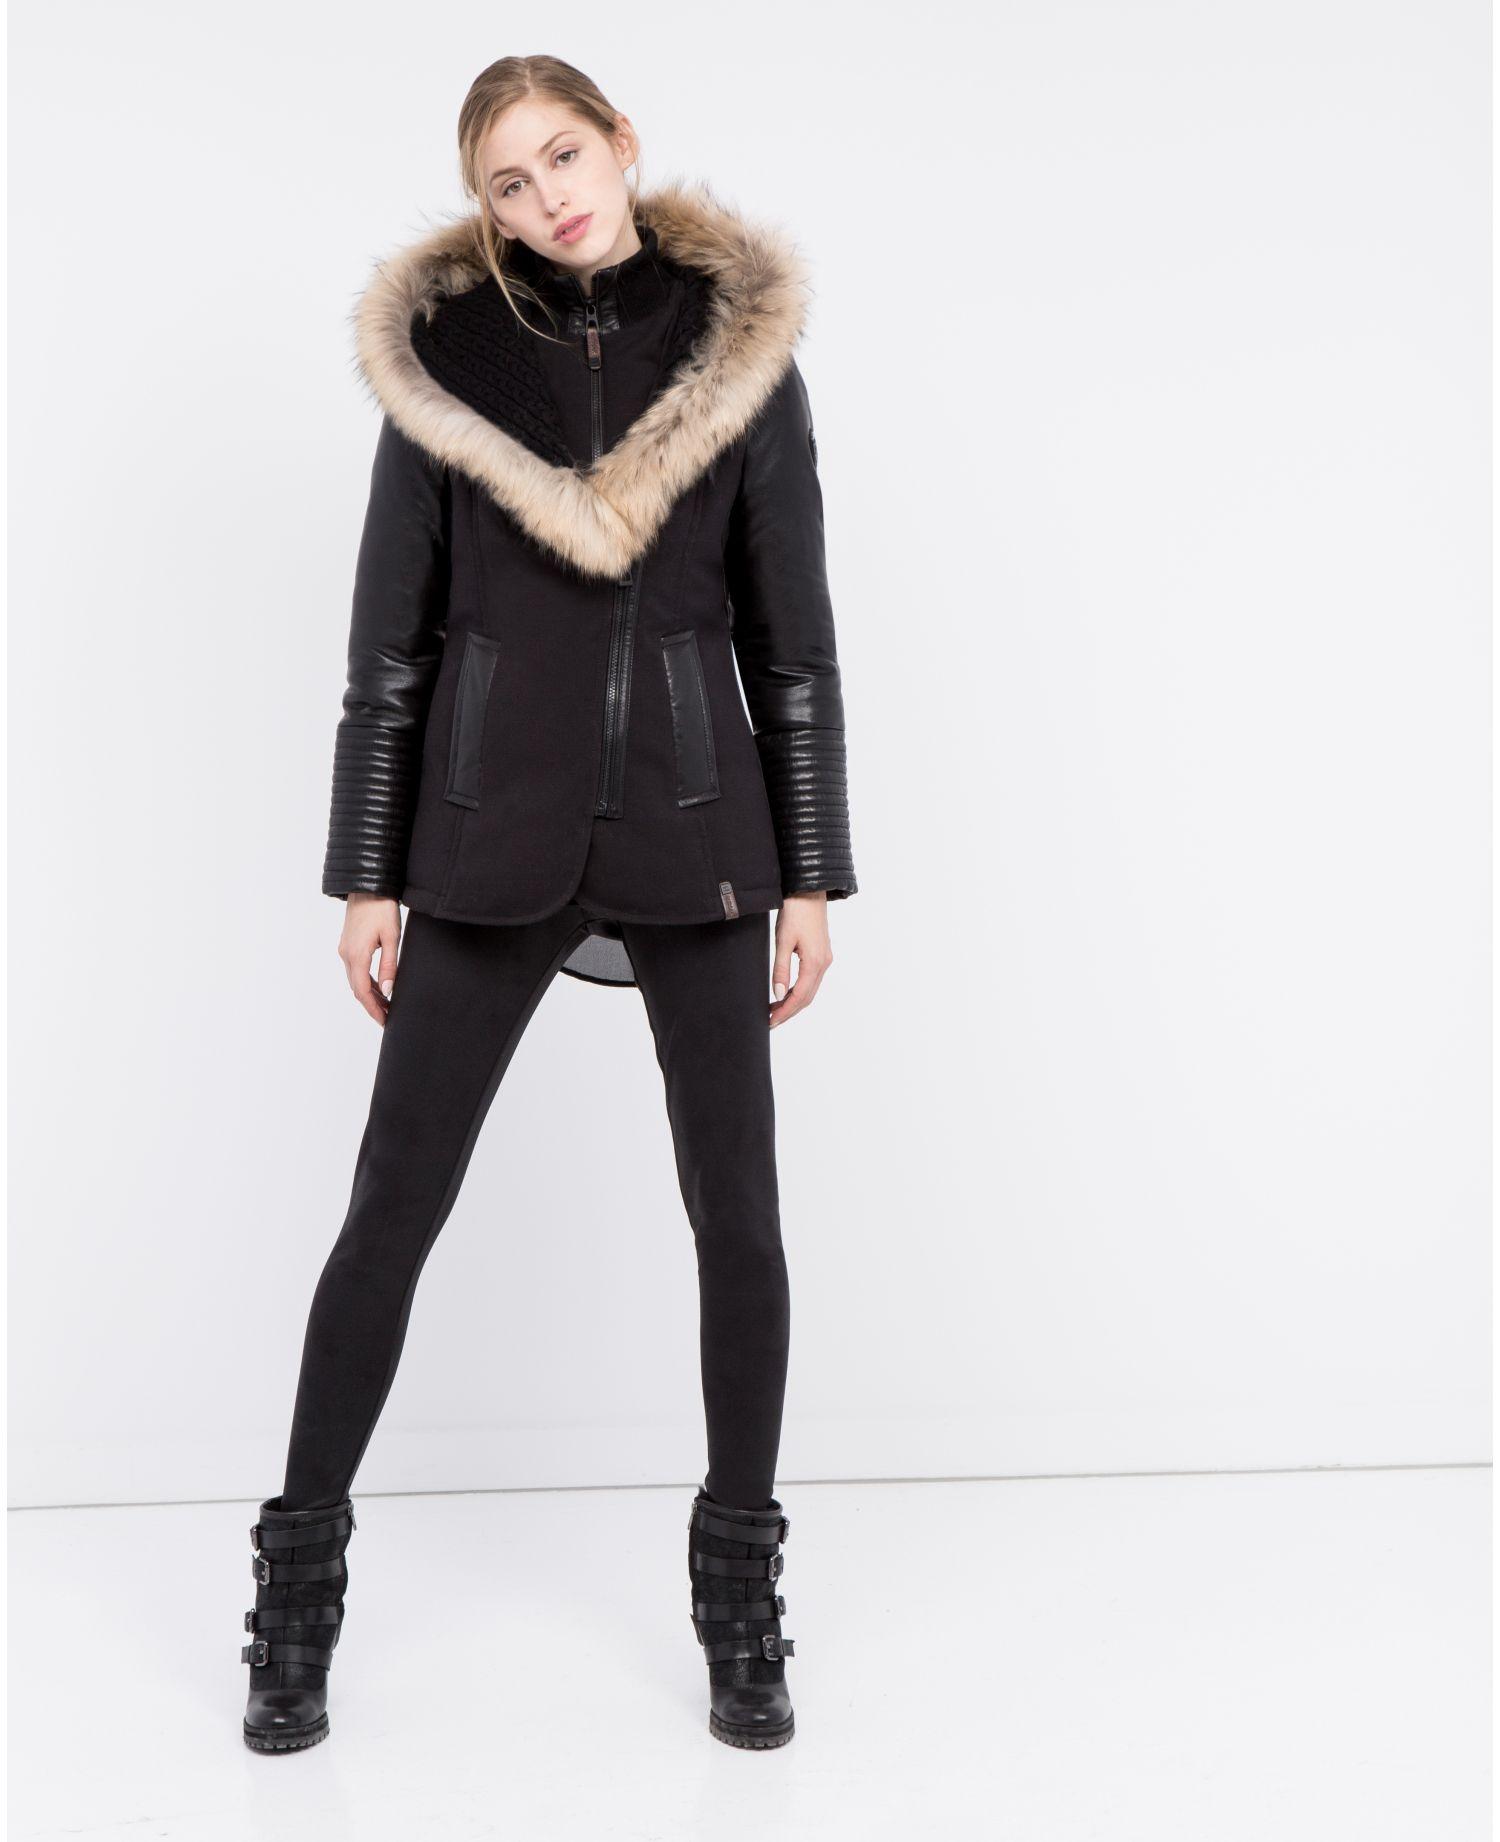 Manteau femme style rudsak